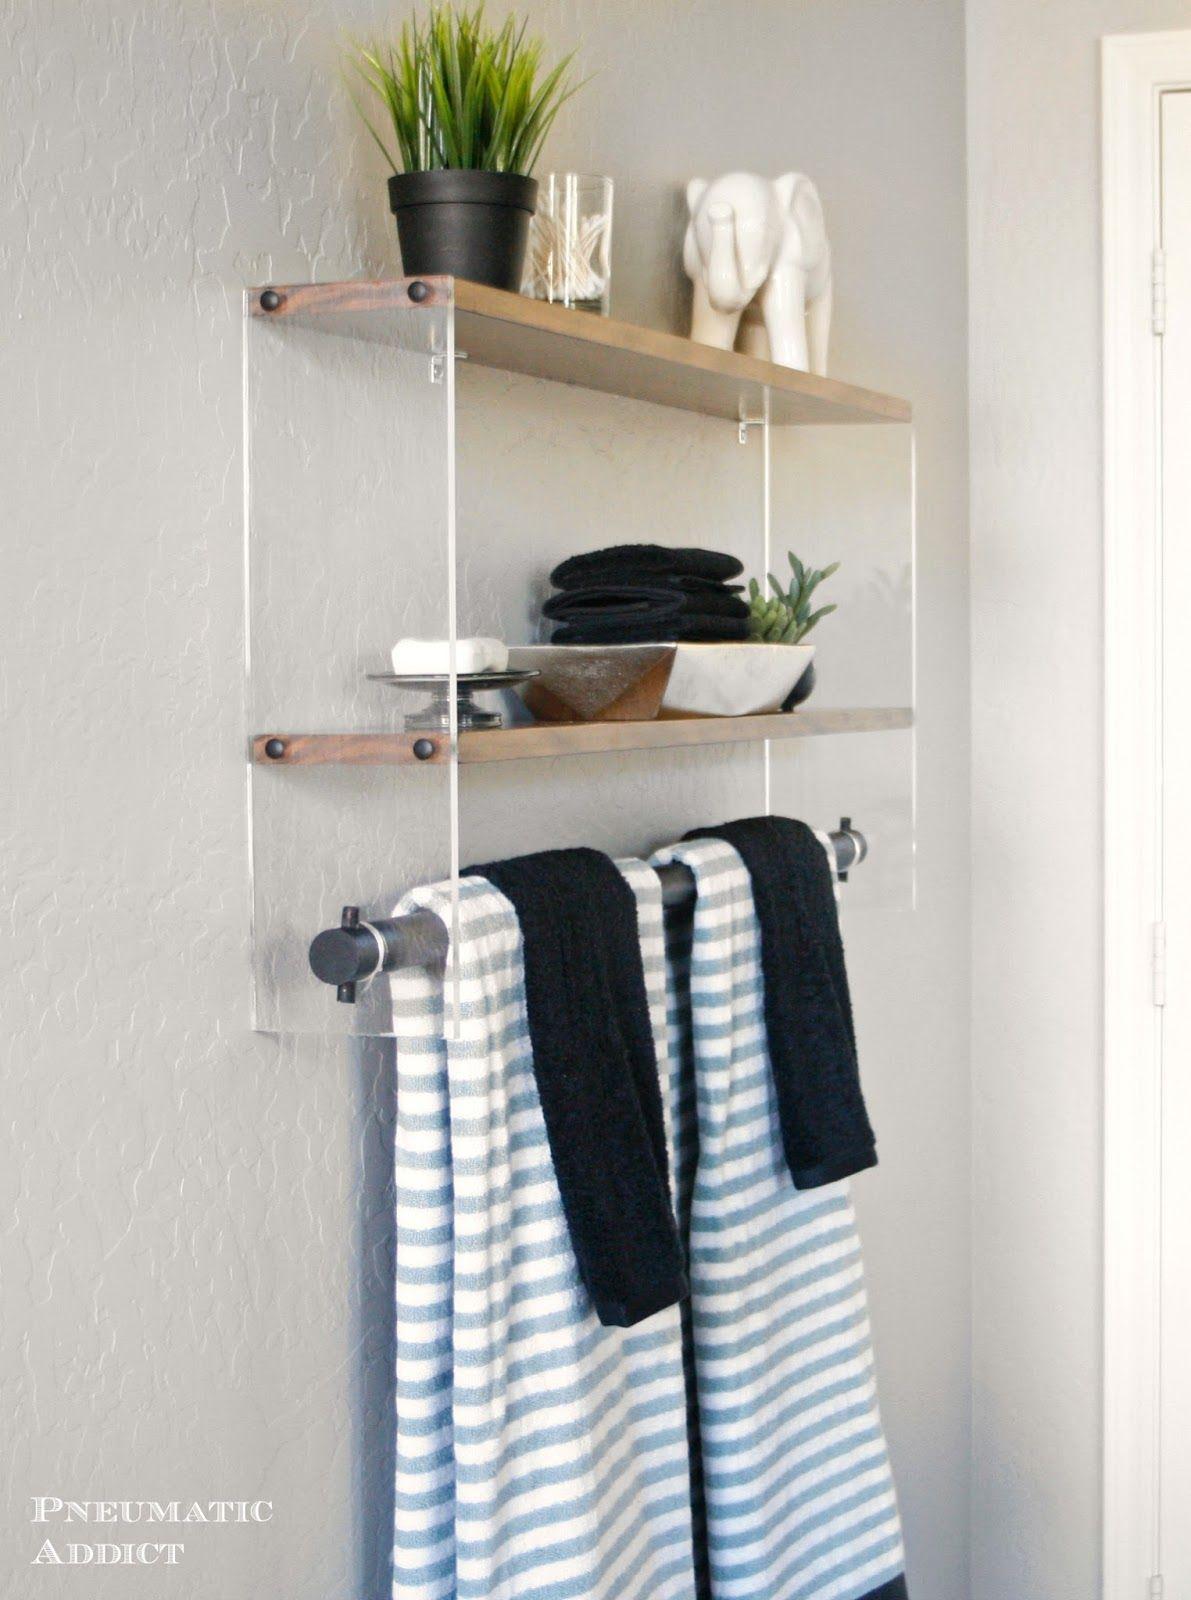 Clear Acrylic And Wood Bathroom Shelf Building Plans